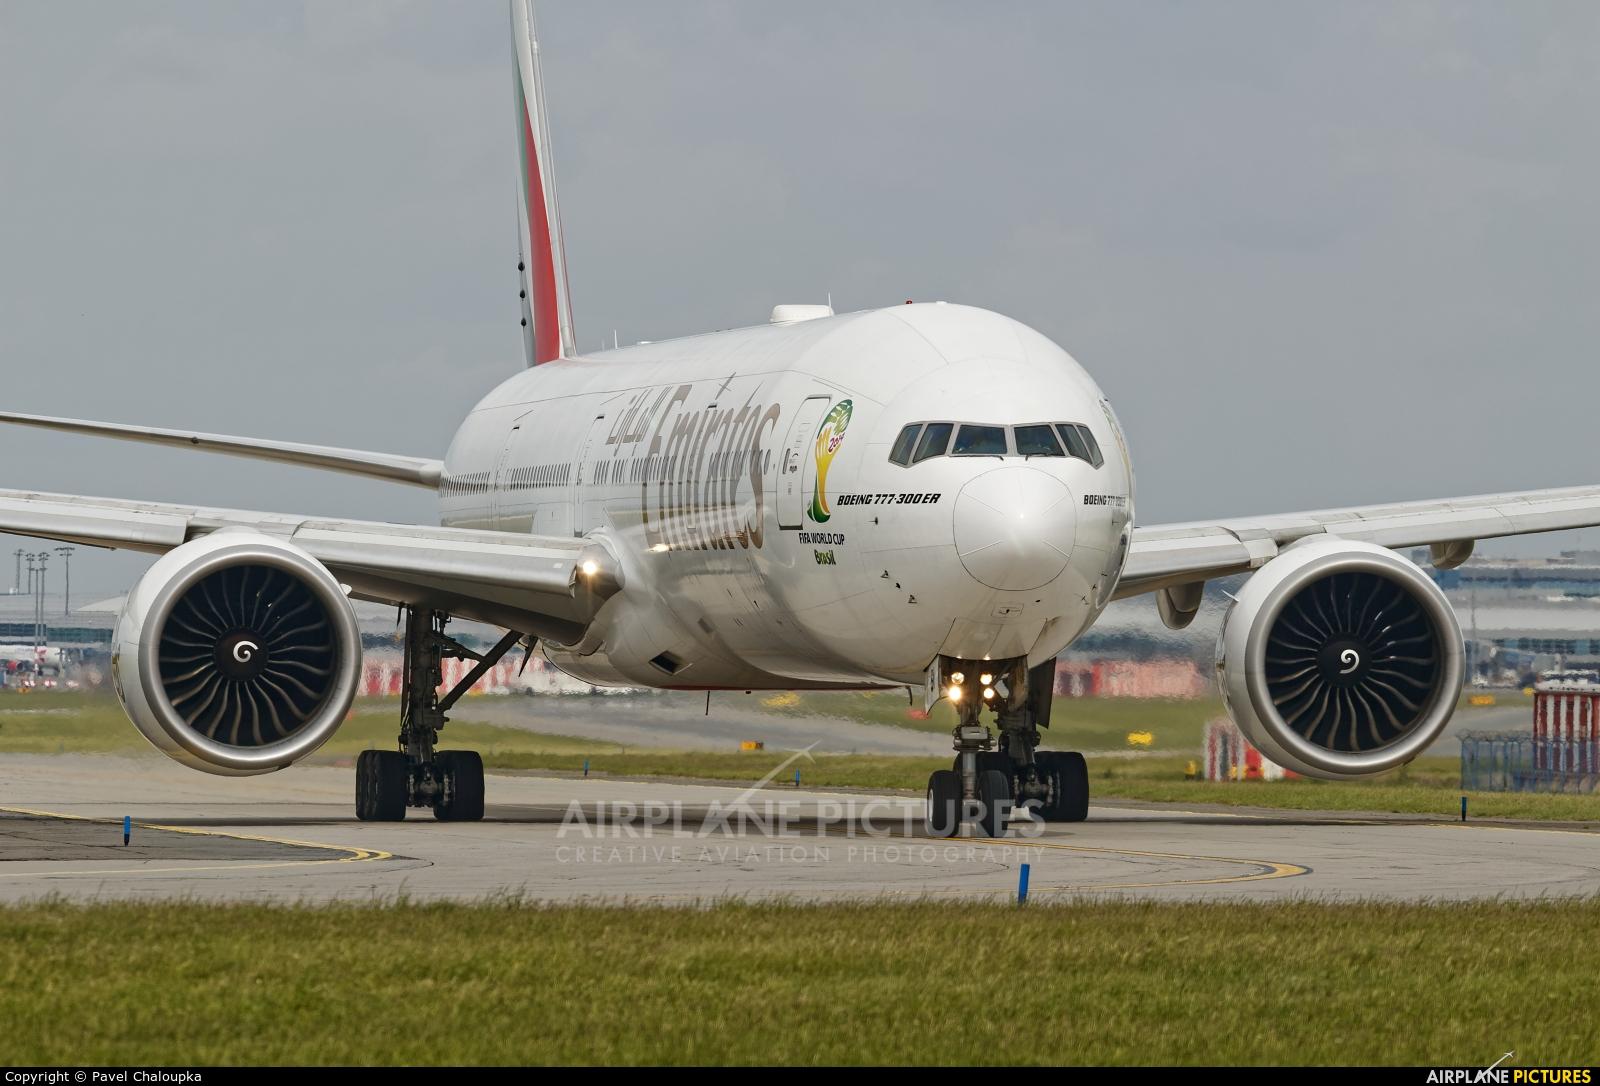 Emirates Airlines A6-EBI aircraft at Prague - Václav Havel